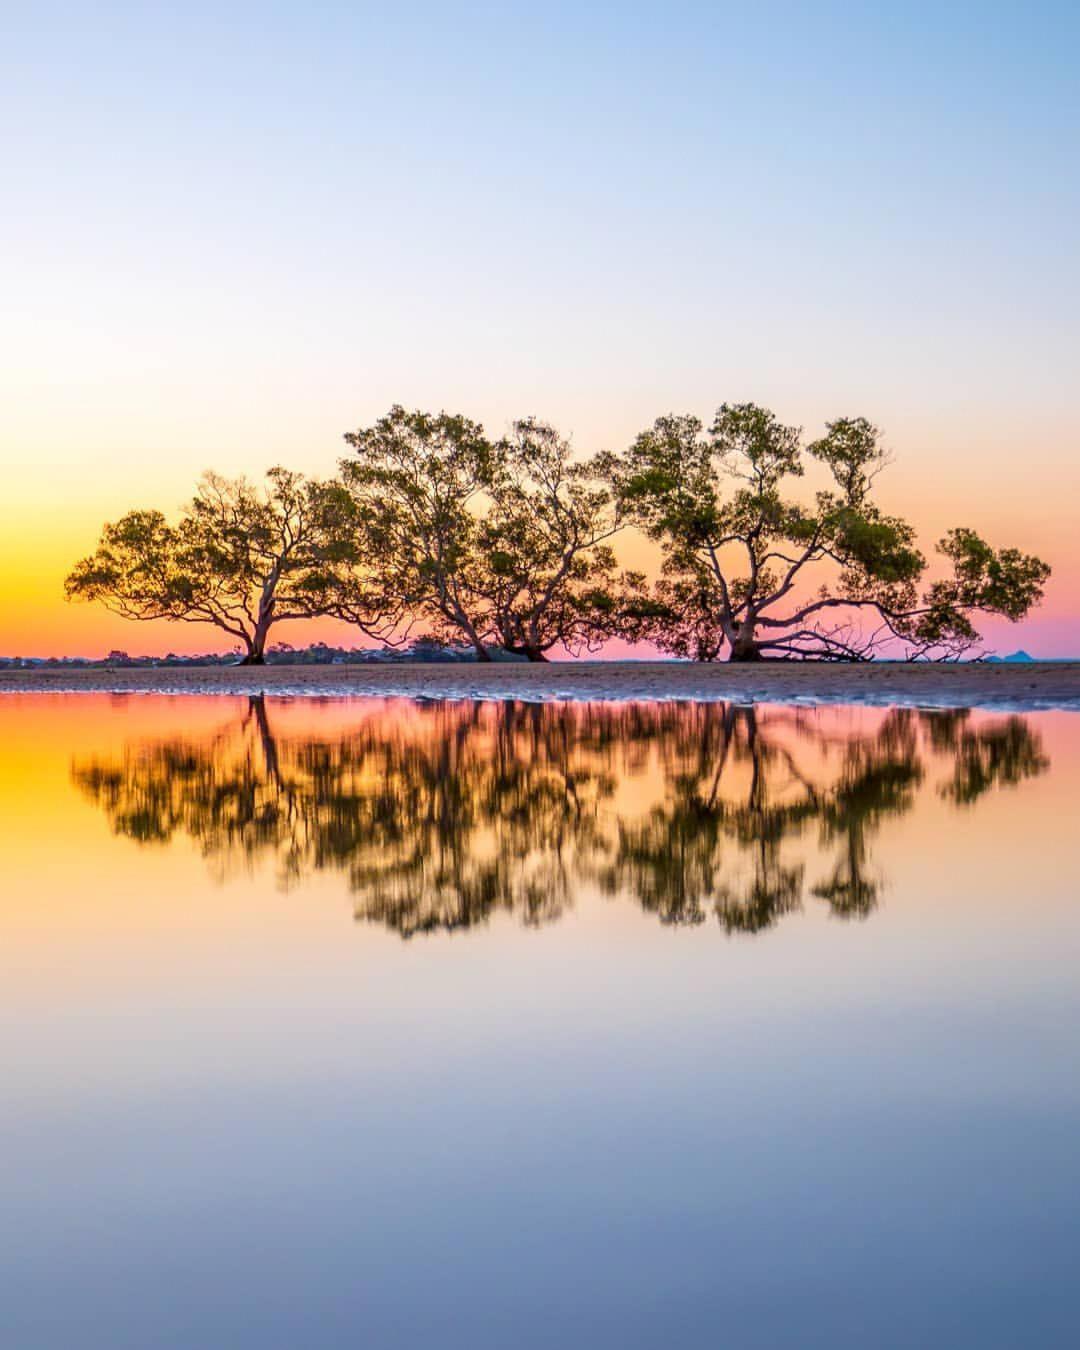 Amazing Australian Landscape Photography By Mitchell Pettigrew Photography Australia Landscape Trave In 2020 Australian Photography Landscape Photography Landscape